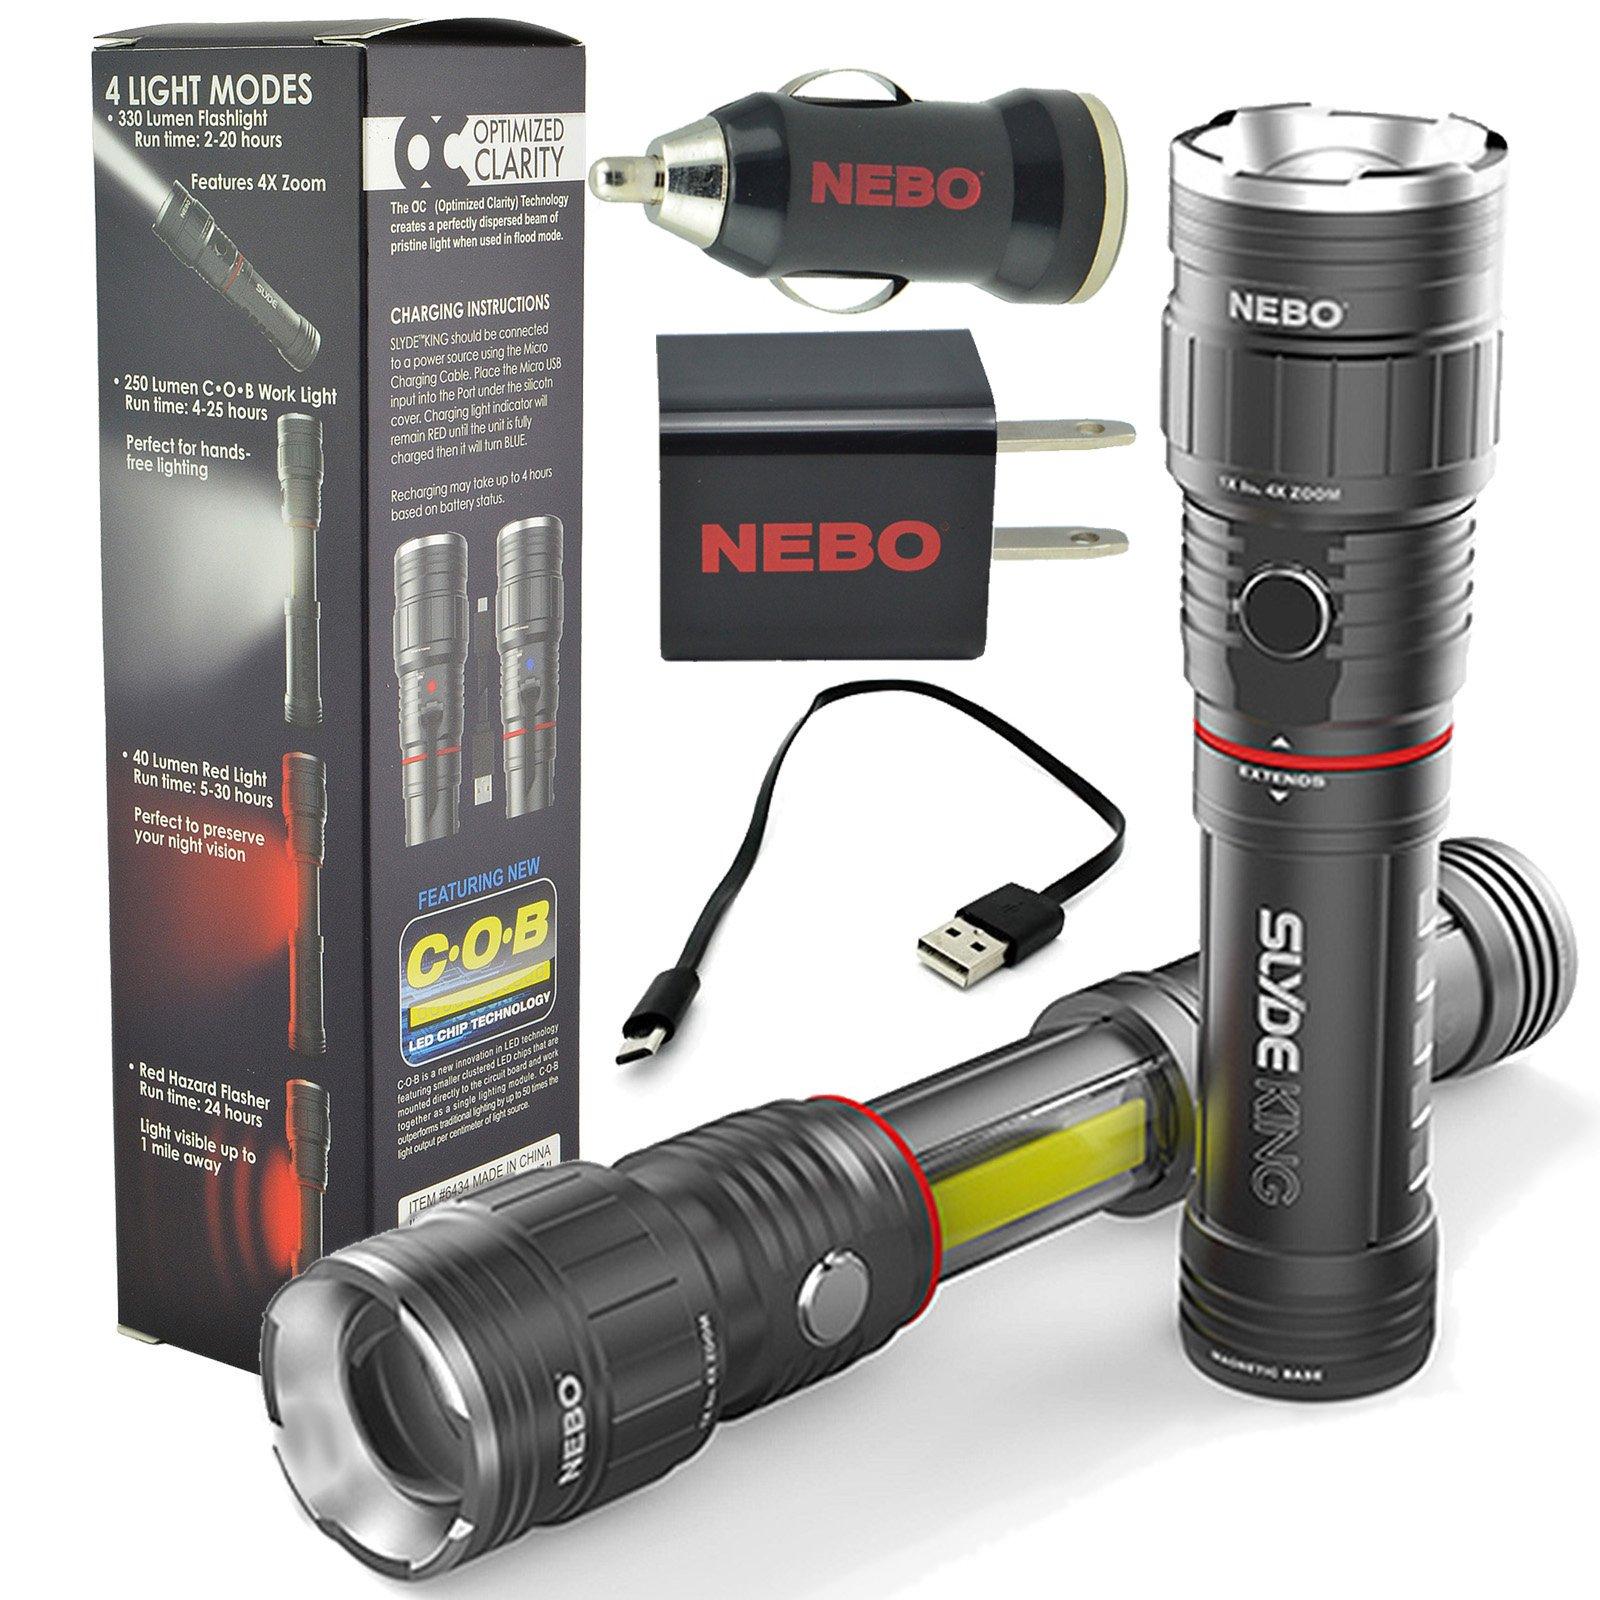 Nebo Slyde King 6434 Rechargeable LED Flashlight Work Light Adjustable Zoom with Nebo USB Plug Adapters